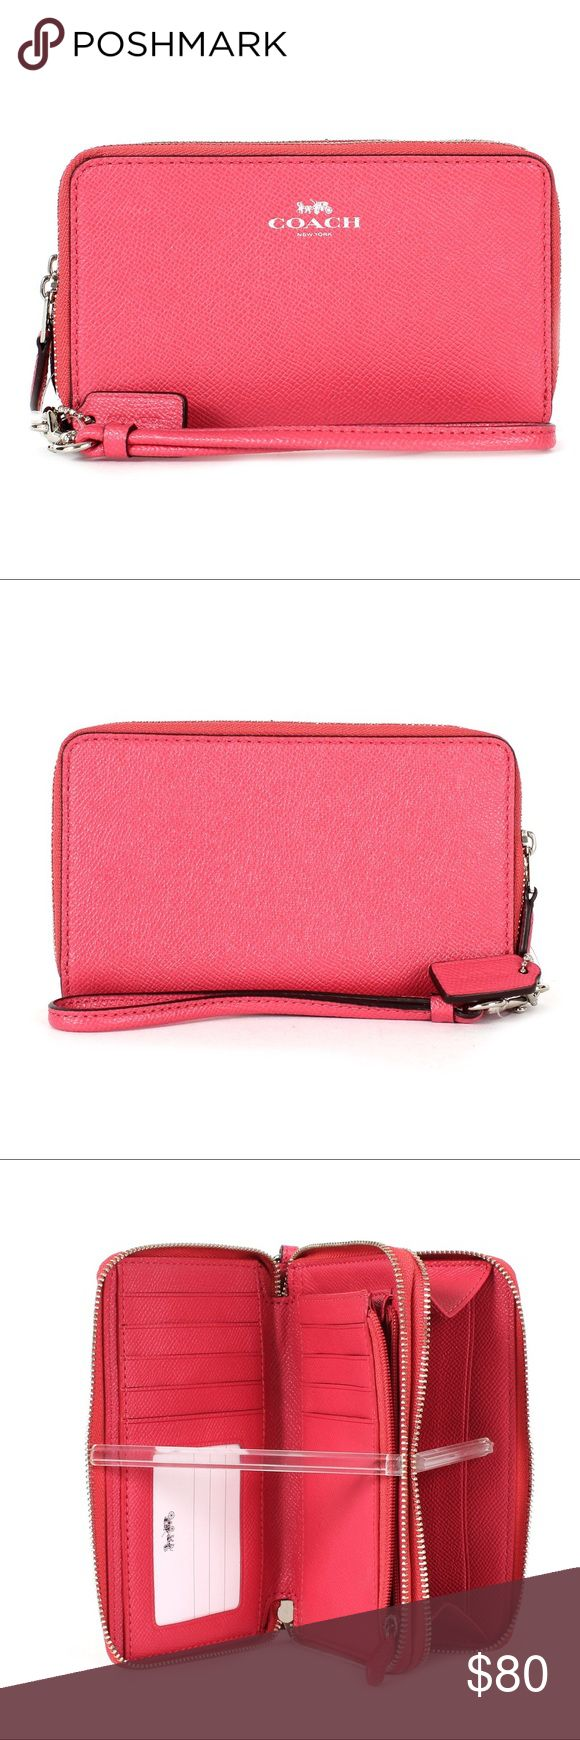 Coach Wristlet Wallet Coach Crossgrain Leather Double Zip Phone Wristlet F57467 Strawberry -new Coach Bags Wallets